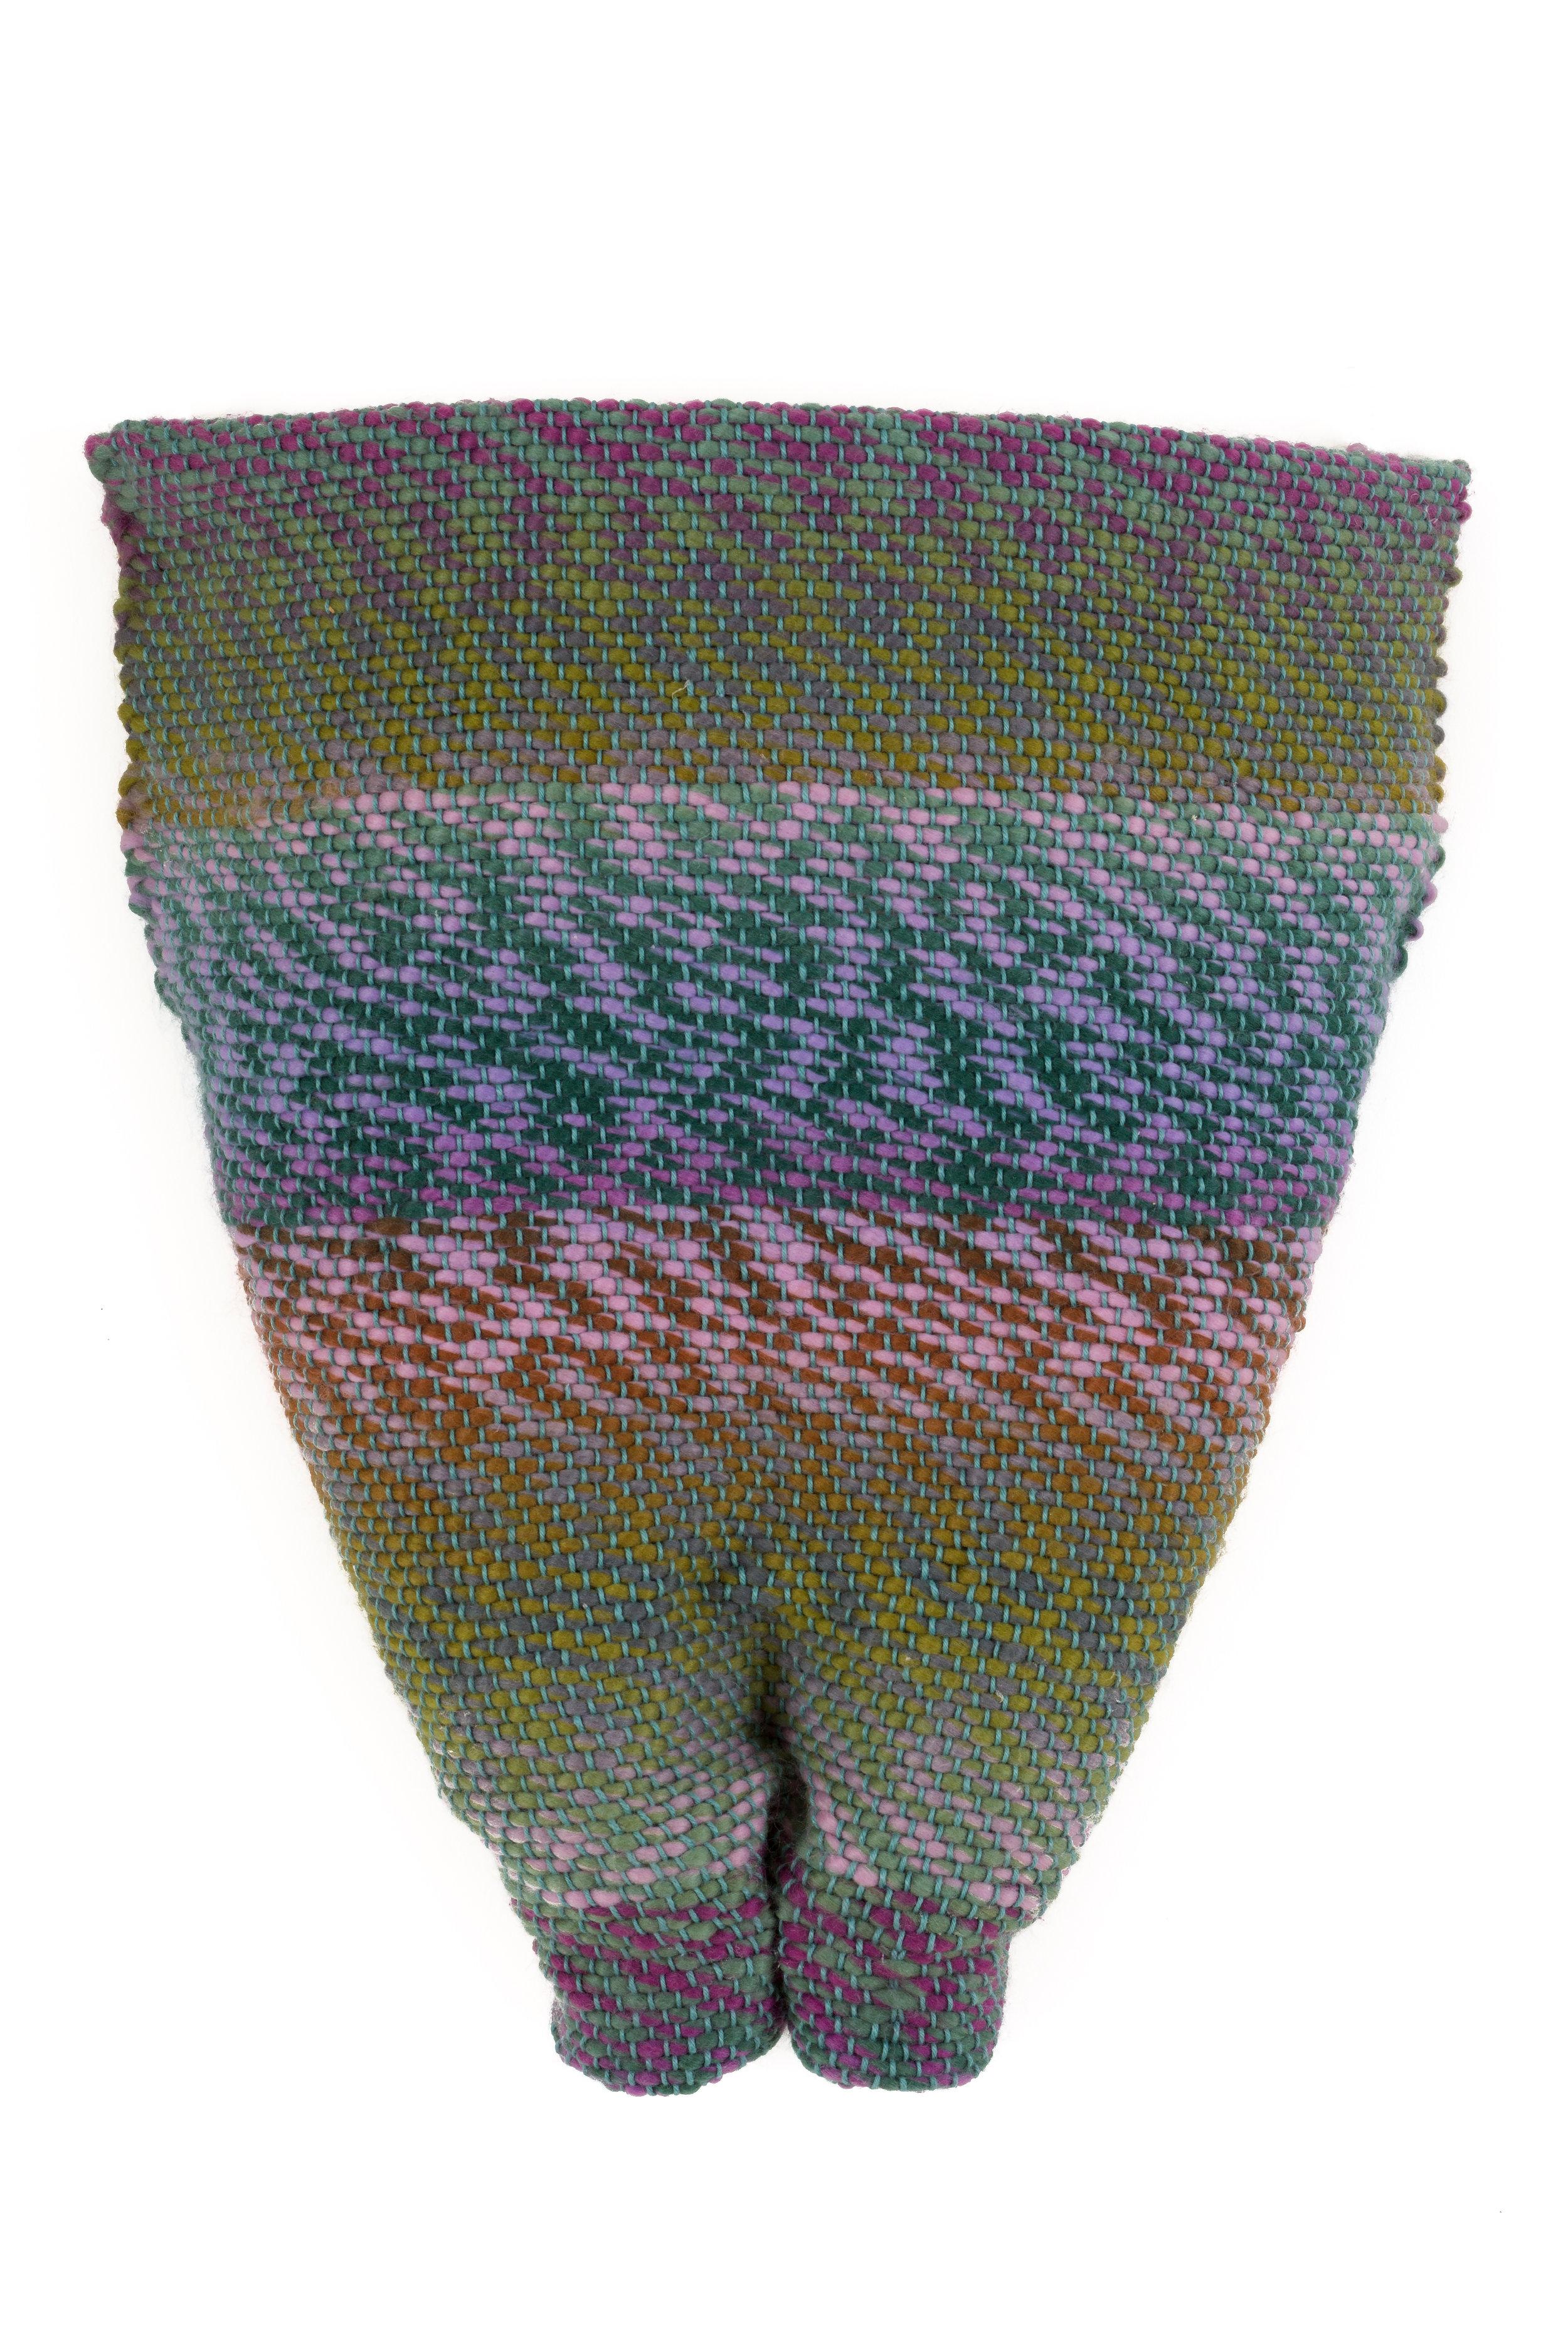 Sylvia Vander Sluis,  Turquoise/Green/Purple Pelvis,  Handwoven acrylic yarn over mesh, 15x12x4